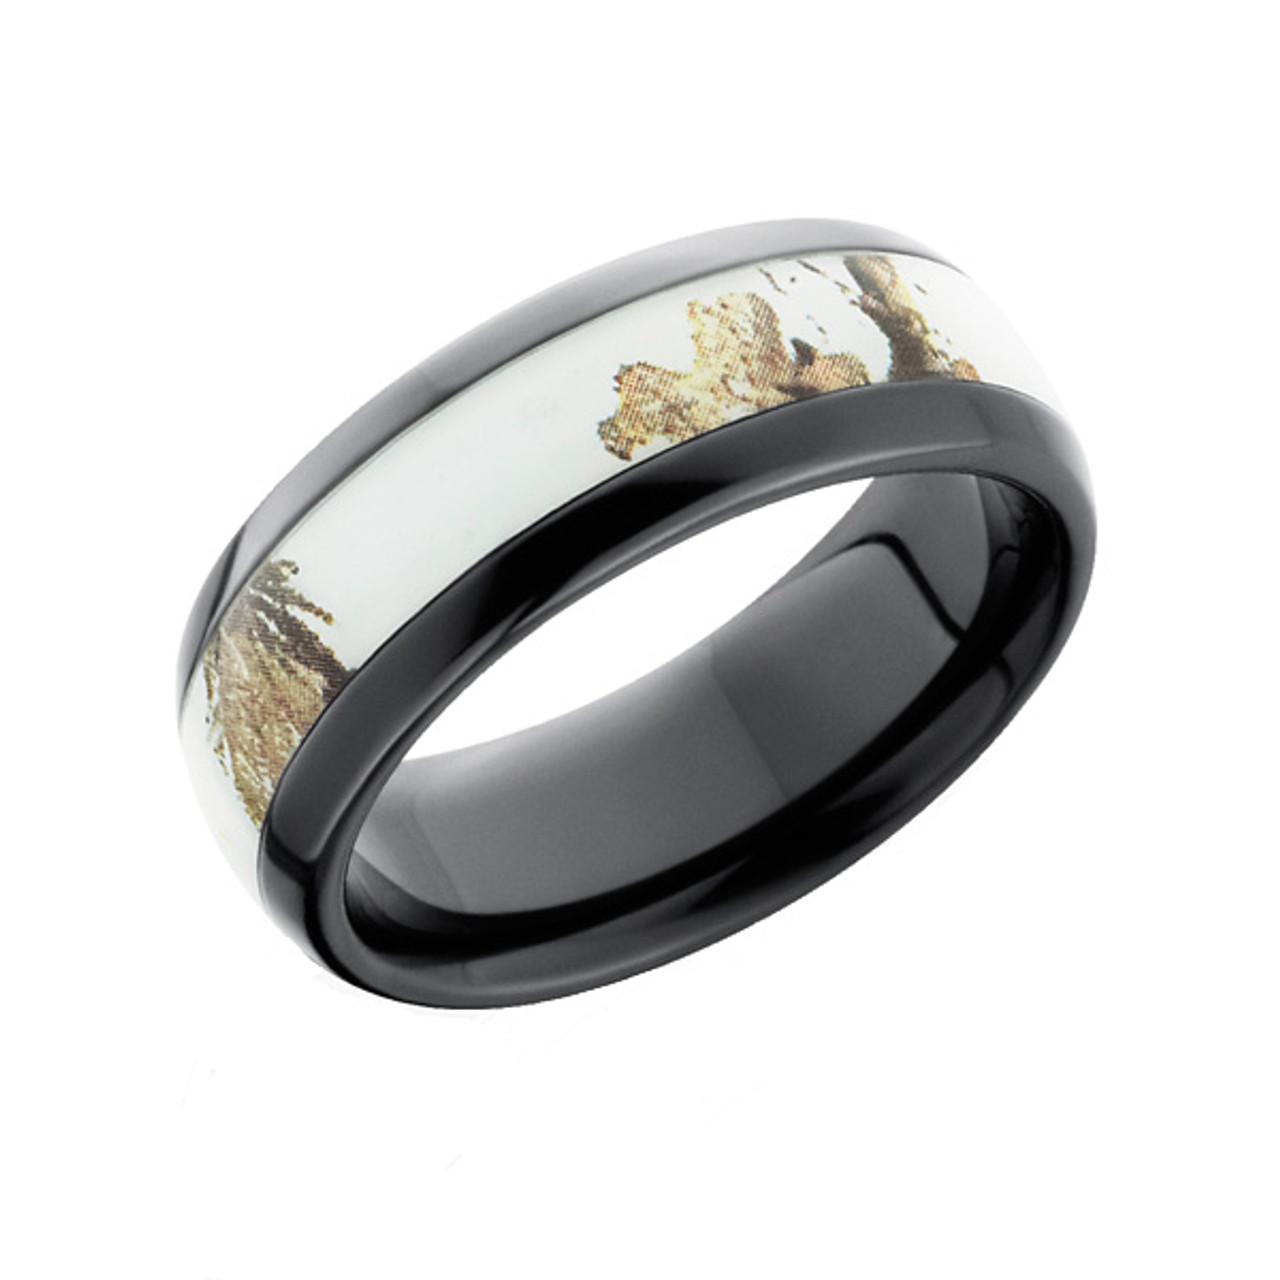 Realtree Or Mossy Oak Camo Ring Domed Black Zirconium Camokix